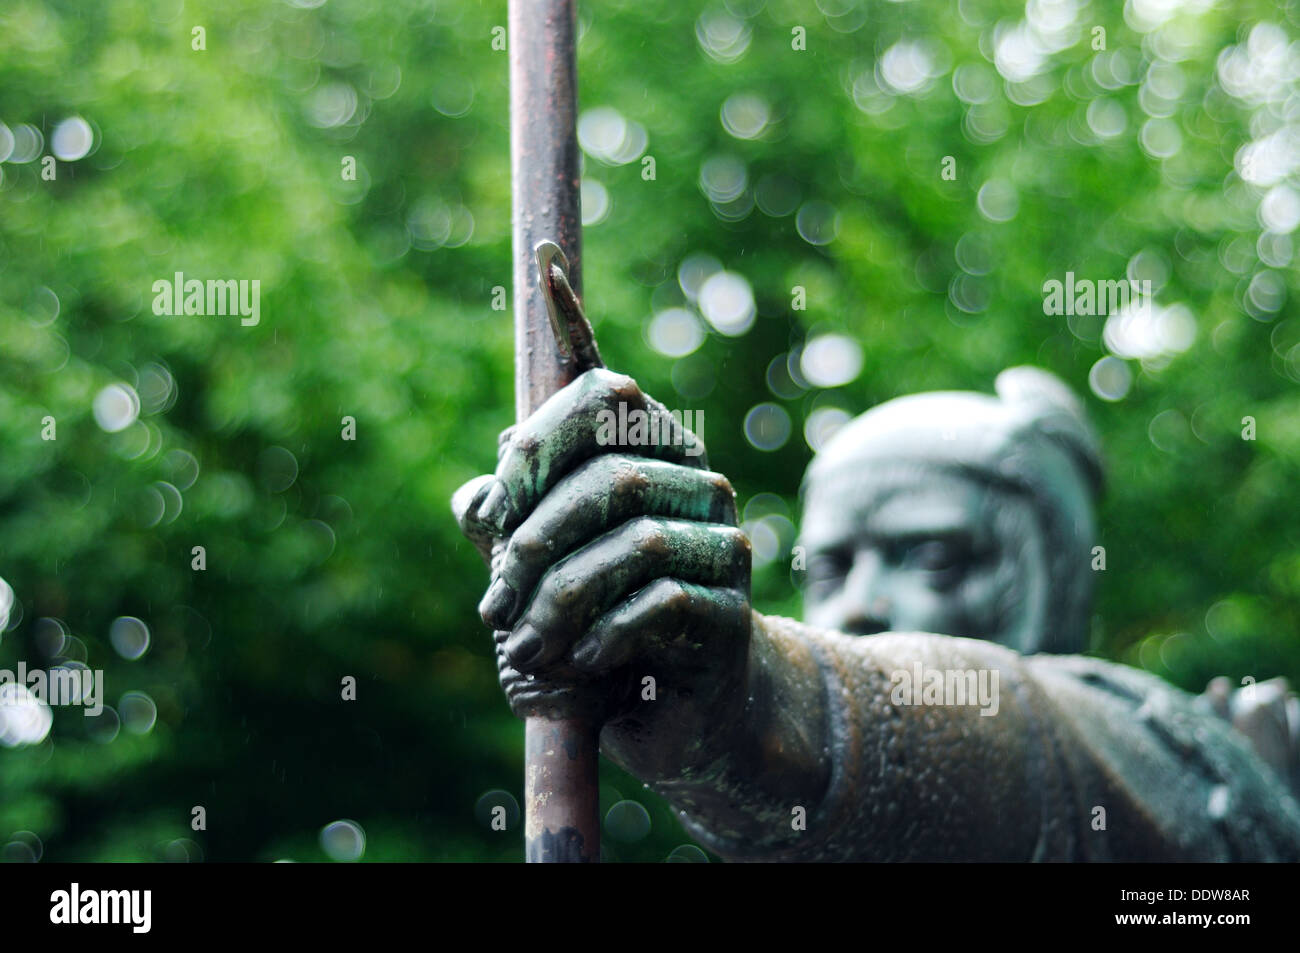 Robin Hood Statue,Nottingham,England. - Stock Image